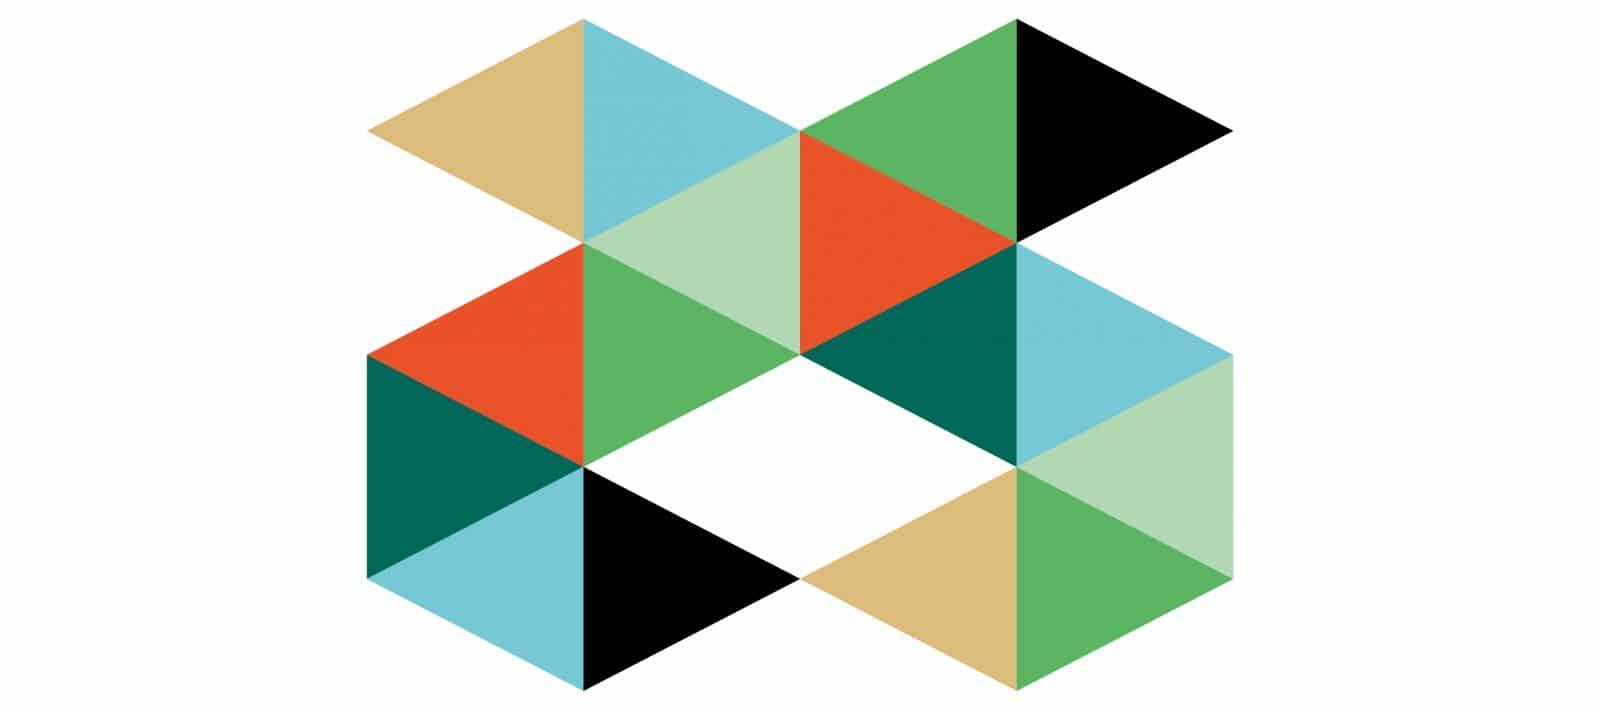 planx-CorporateDesign-Tafelhalle-12-13-25pur-82